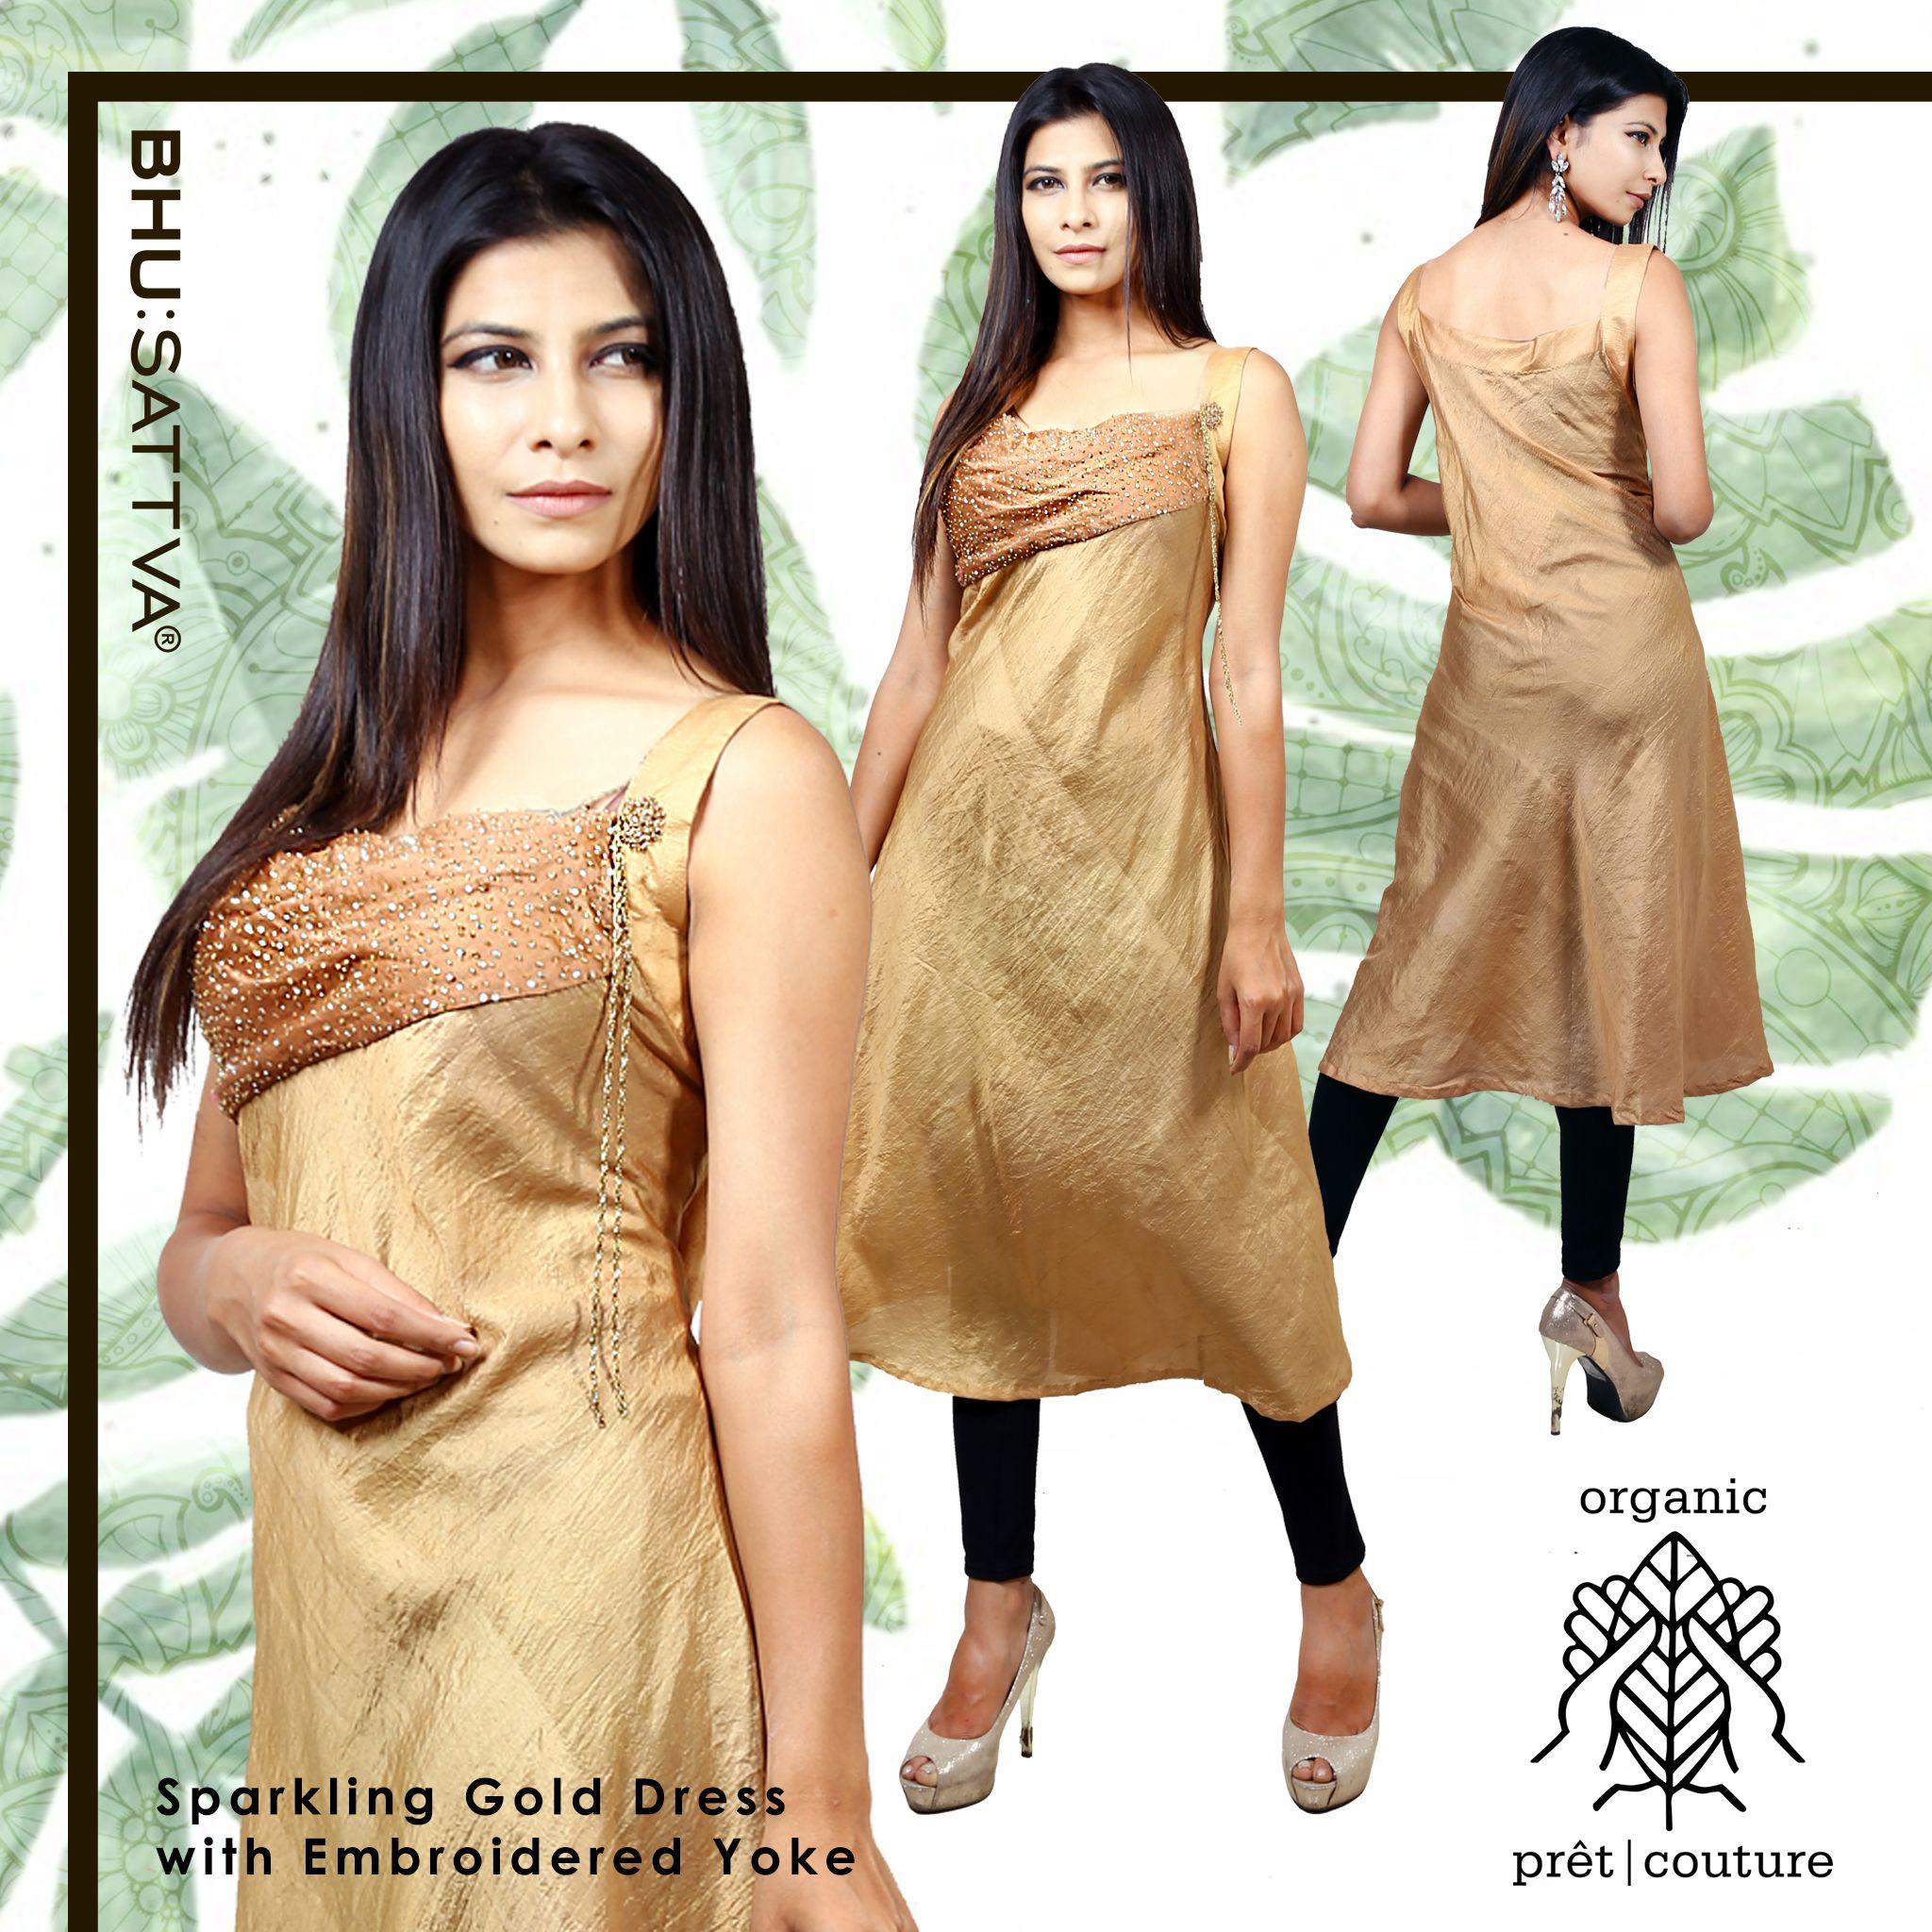 Green is our gold and we respect its preciousness. Embrace this classy and sparkling sleeveless golden dress with embroidered yoke, from the house of #Bhusattva  #Organic #Pret #Couture #GoldDress #Sleeveless #GreenGold #HandEmbroidered #SkinFriendly #BreatheEasy #ReflectOrganic #RevealYourself #iWearBhusattva #BelieveWhatYouWear #TrustNature #MysticalNature #CloseToNature #OrganicIdeology #OrganicCollection #NaturalDyes #EcoFashion #OrganicFashion #SustainableFashion #GoOrganic